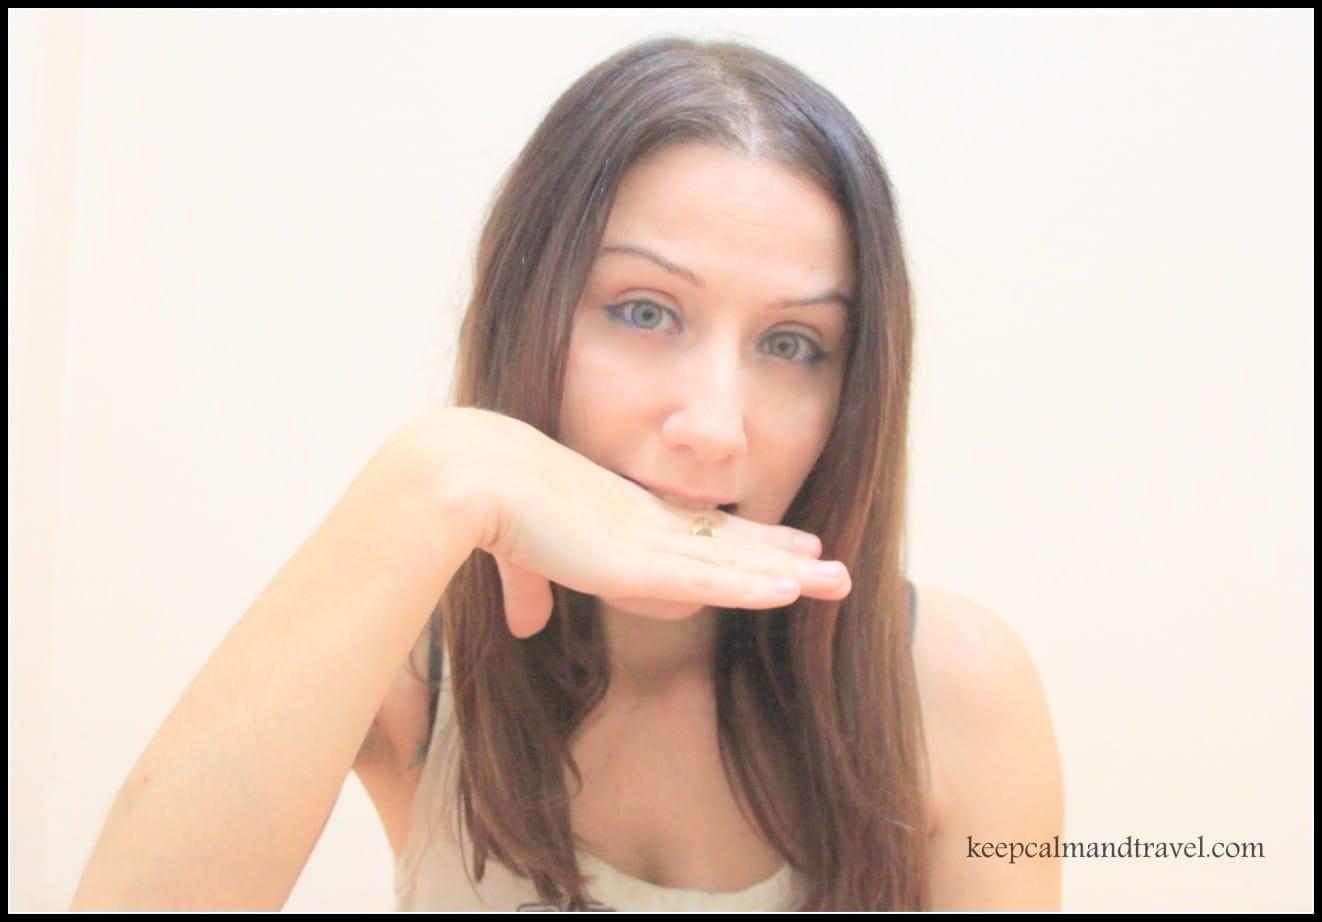 Italian_Gestures_If-i-catch-you-i-kill you_Clelia-Mattana_keep-calm-and-travel